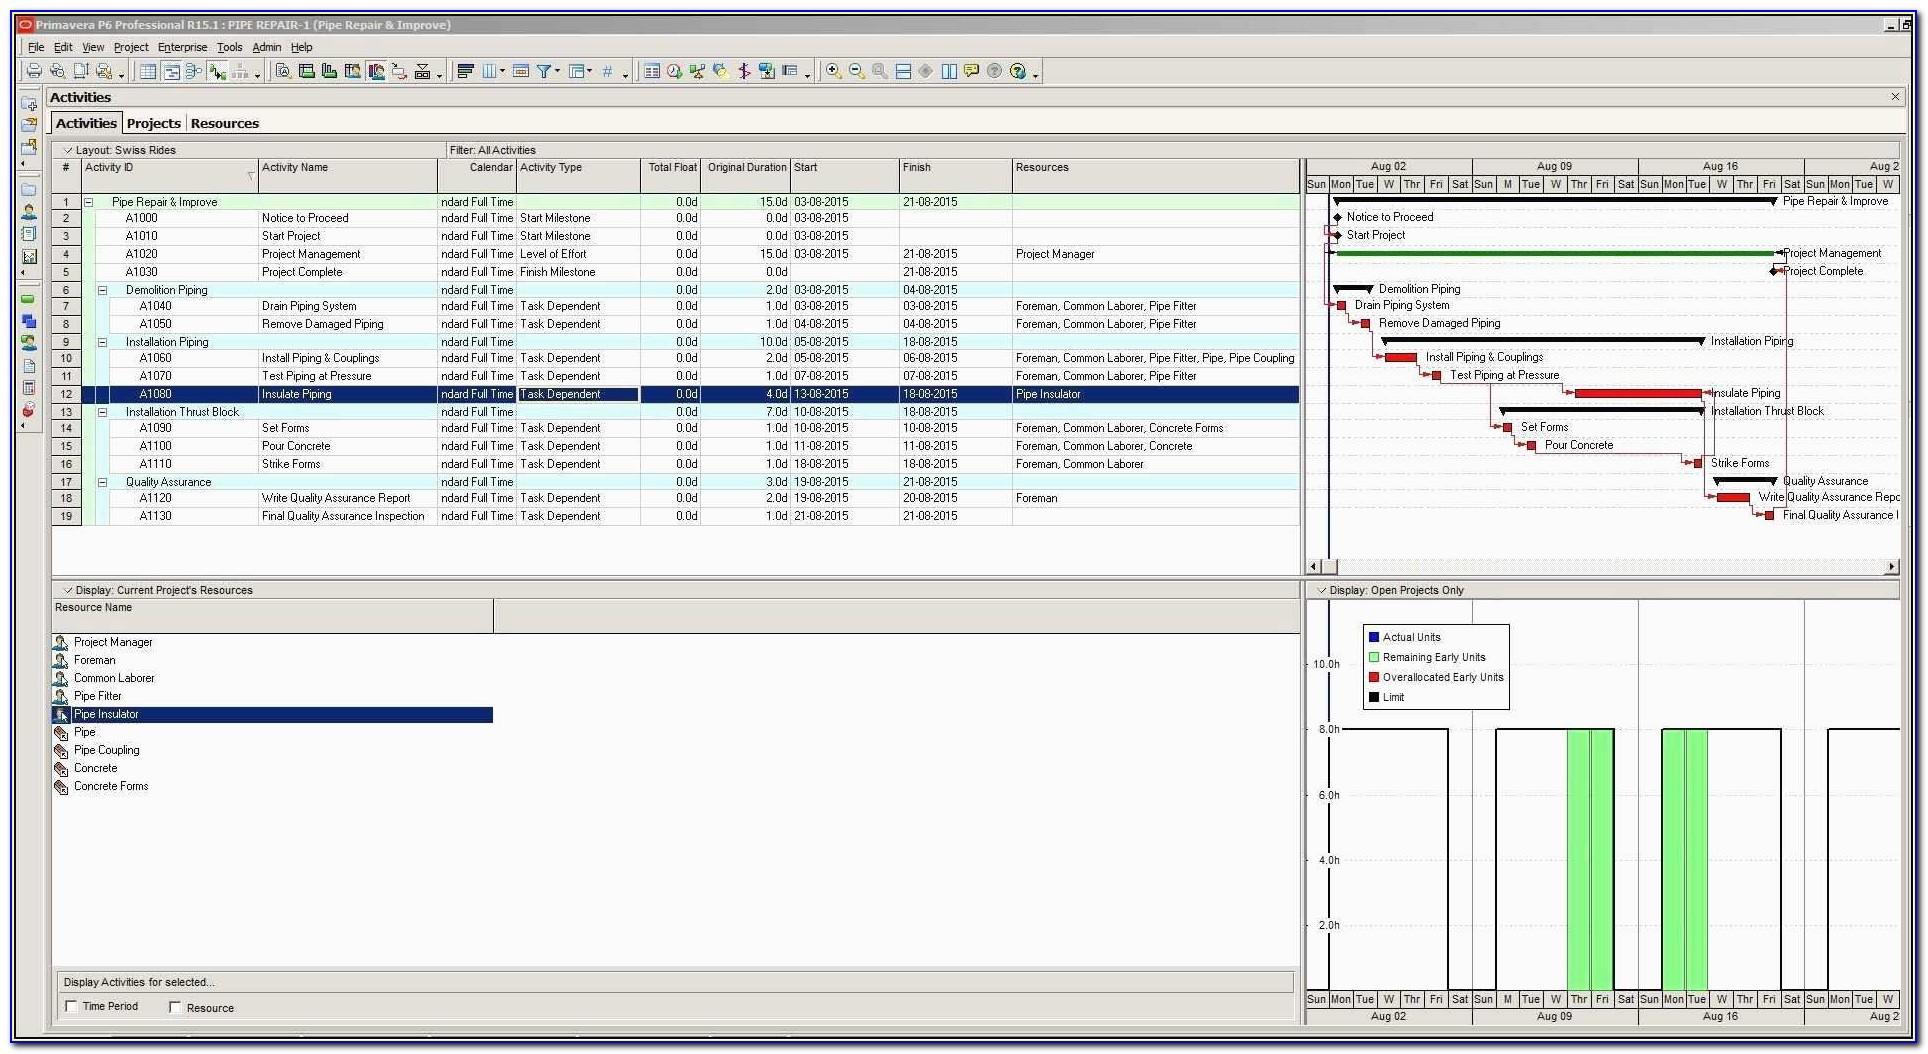 Best Resume Builder Software Free Download Cv Maker Best College Resume Builder From Free Resume Builder App Examples